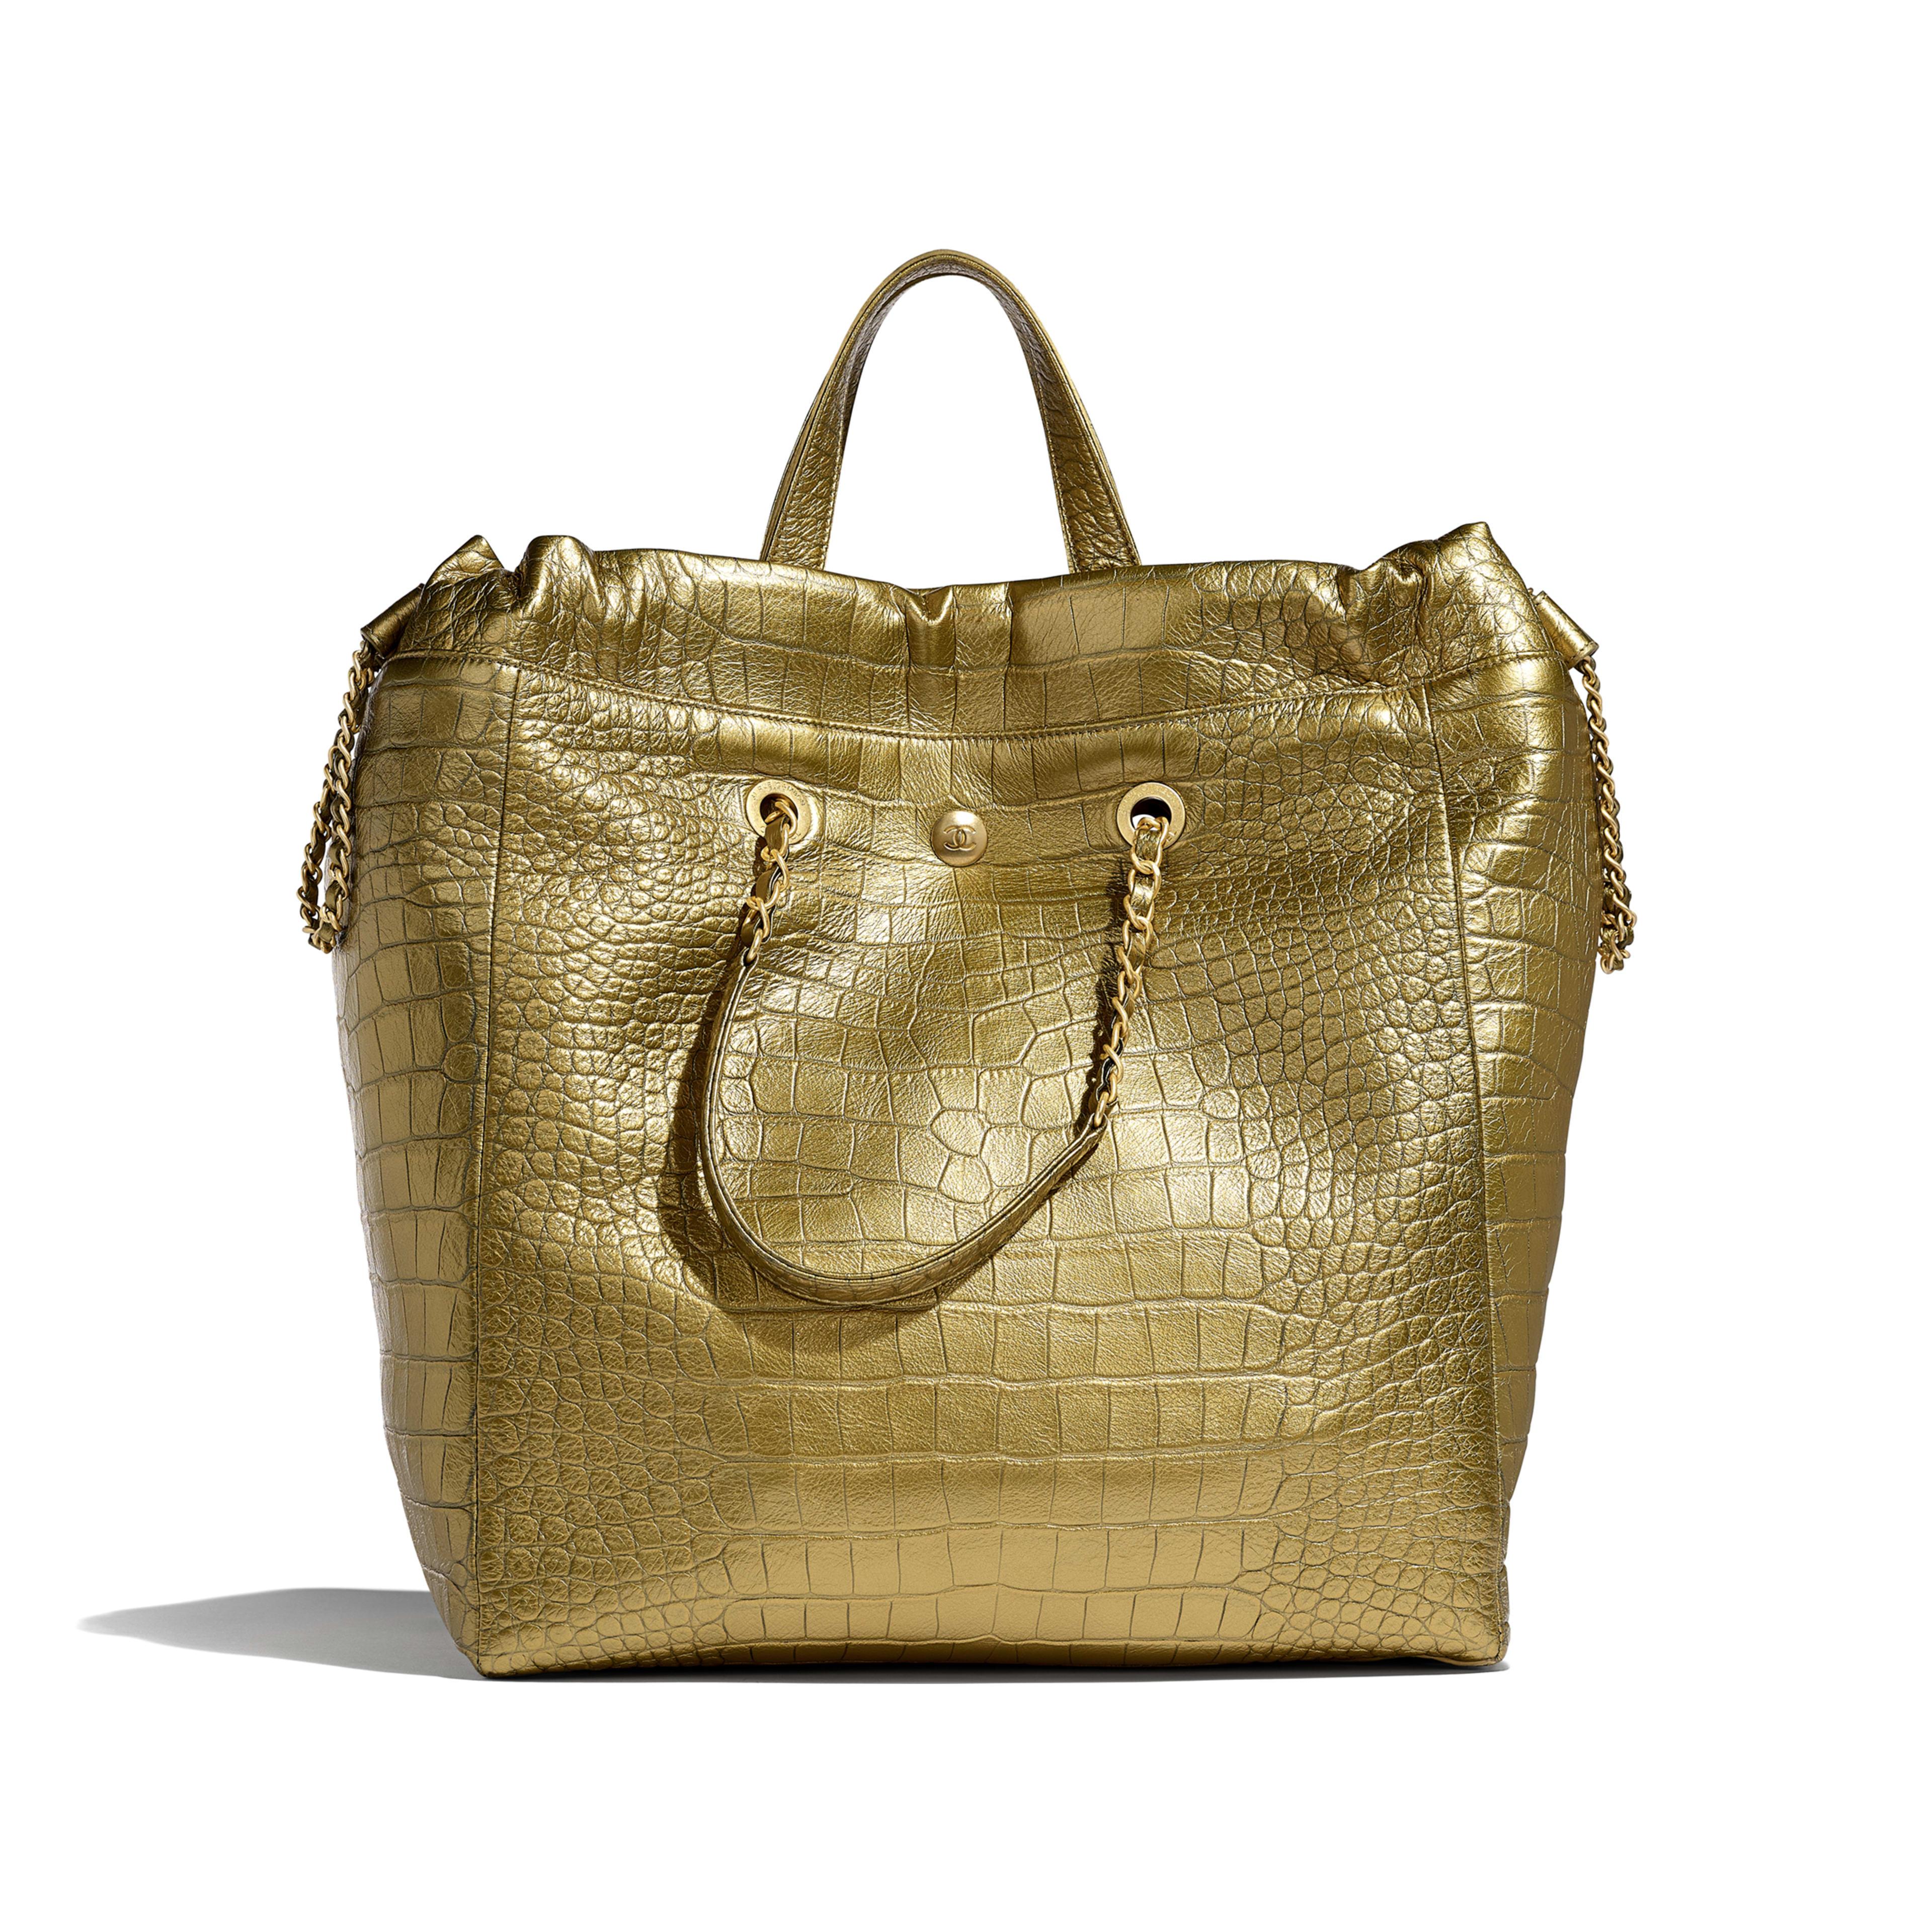 Large Shopping Bag - Gold - Metallic Crocodile Embossed Calfskin & Gold Metal - Alternative view - see full sized version